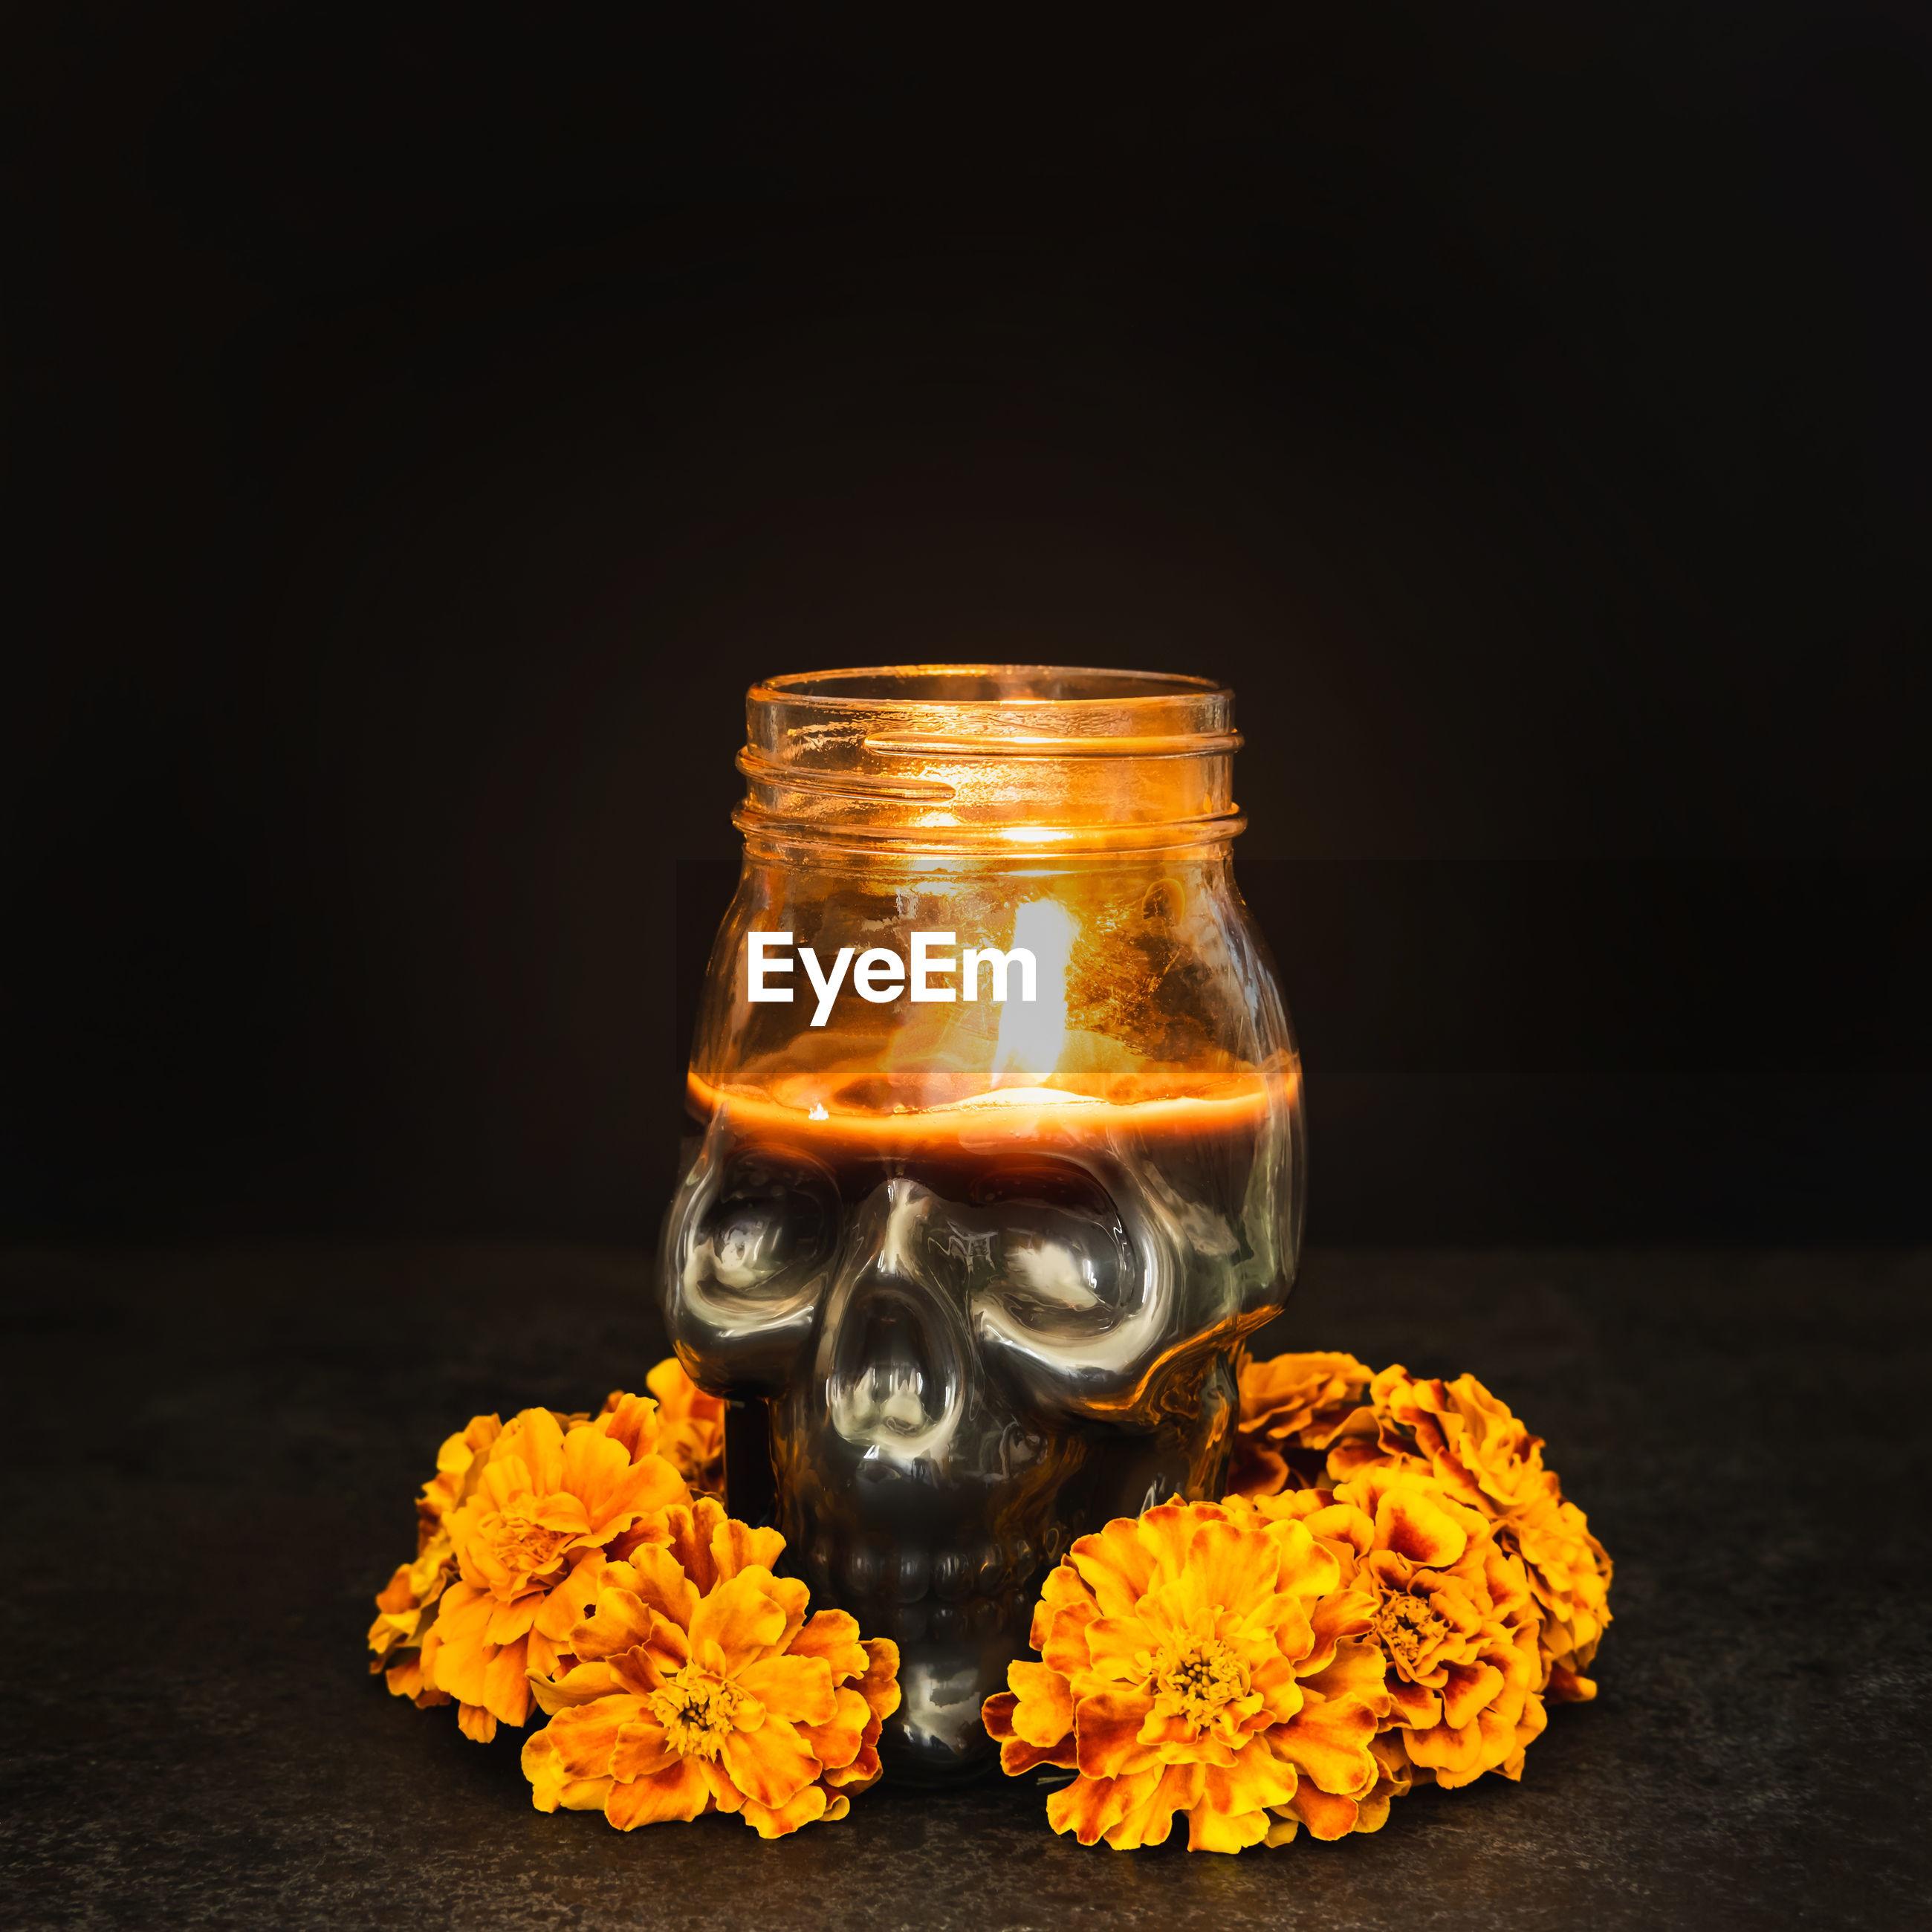 CLOSE-UP OF ORANGE FLOWERS IN JAR